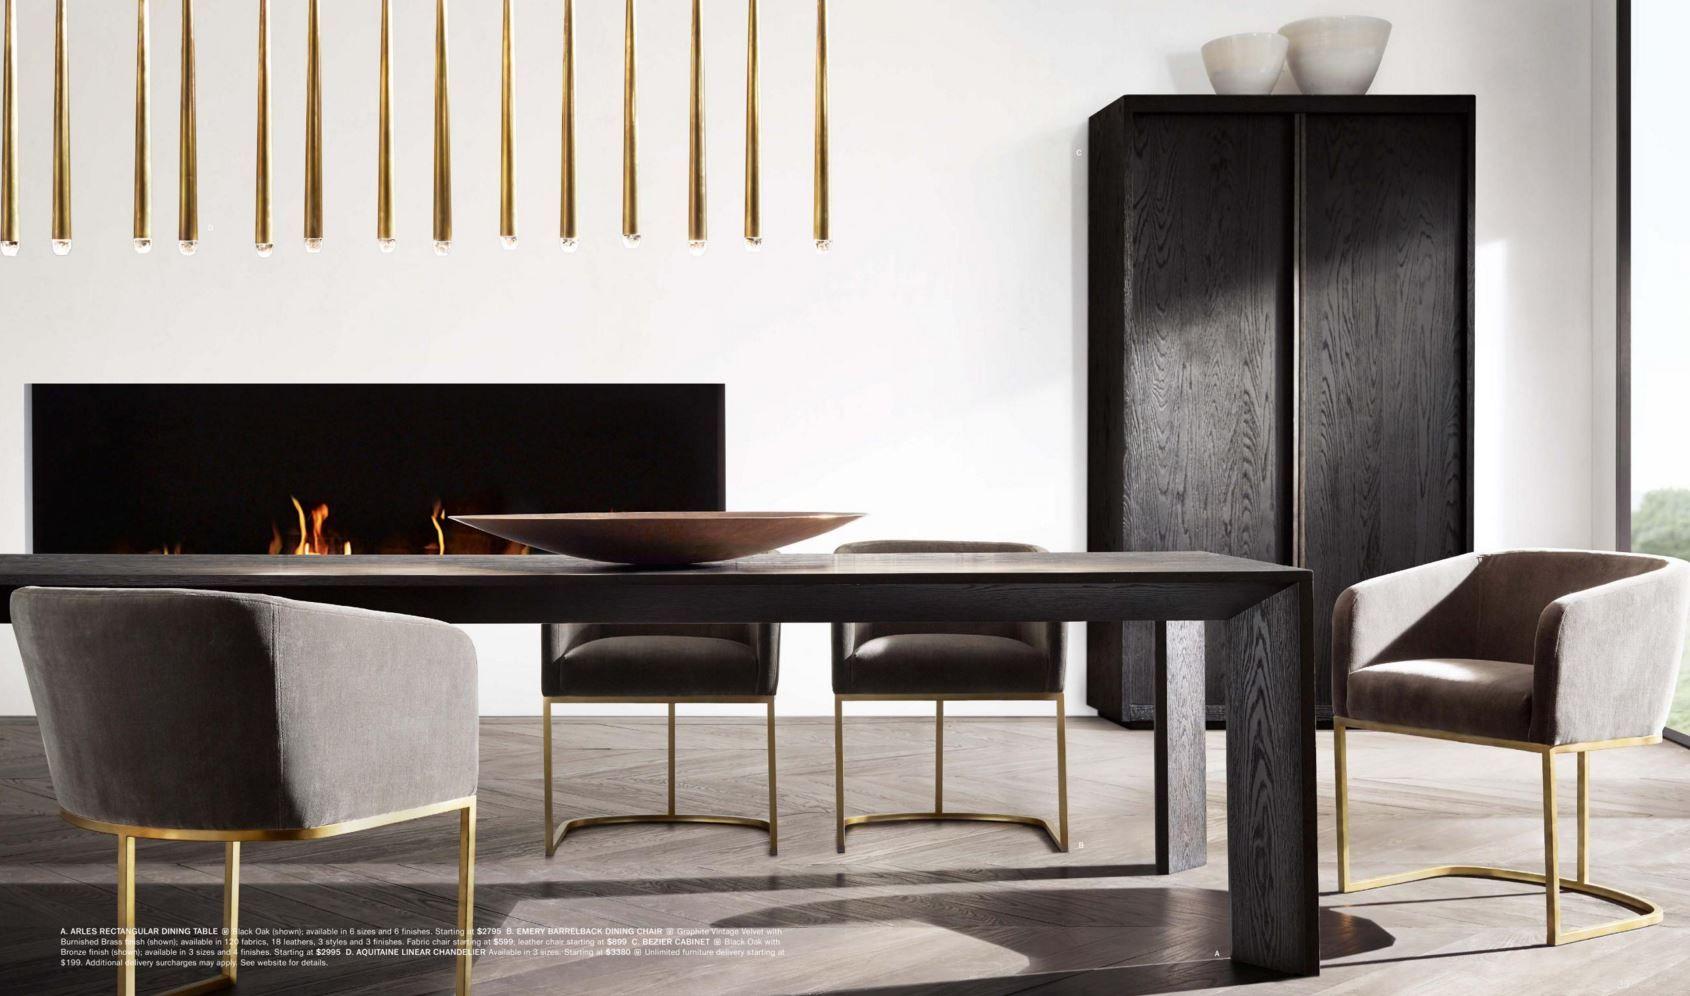 Pin By Petra Zachveja On Rh Restoration Hardware Modern Dining Room Dining Room Design Home Decor [ 996 x 1690 Pixel ]